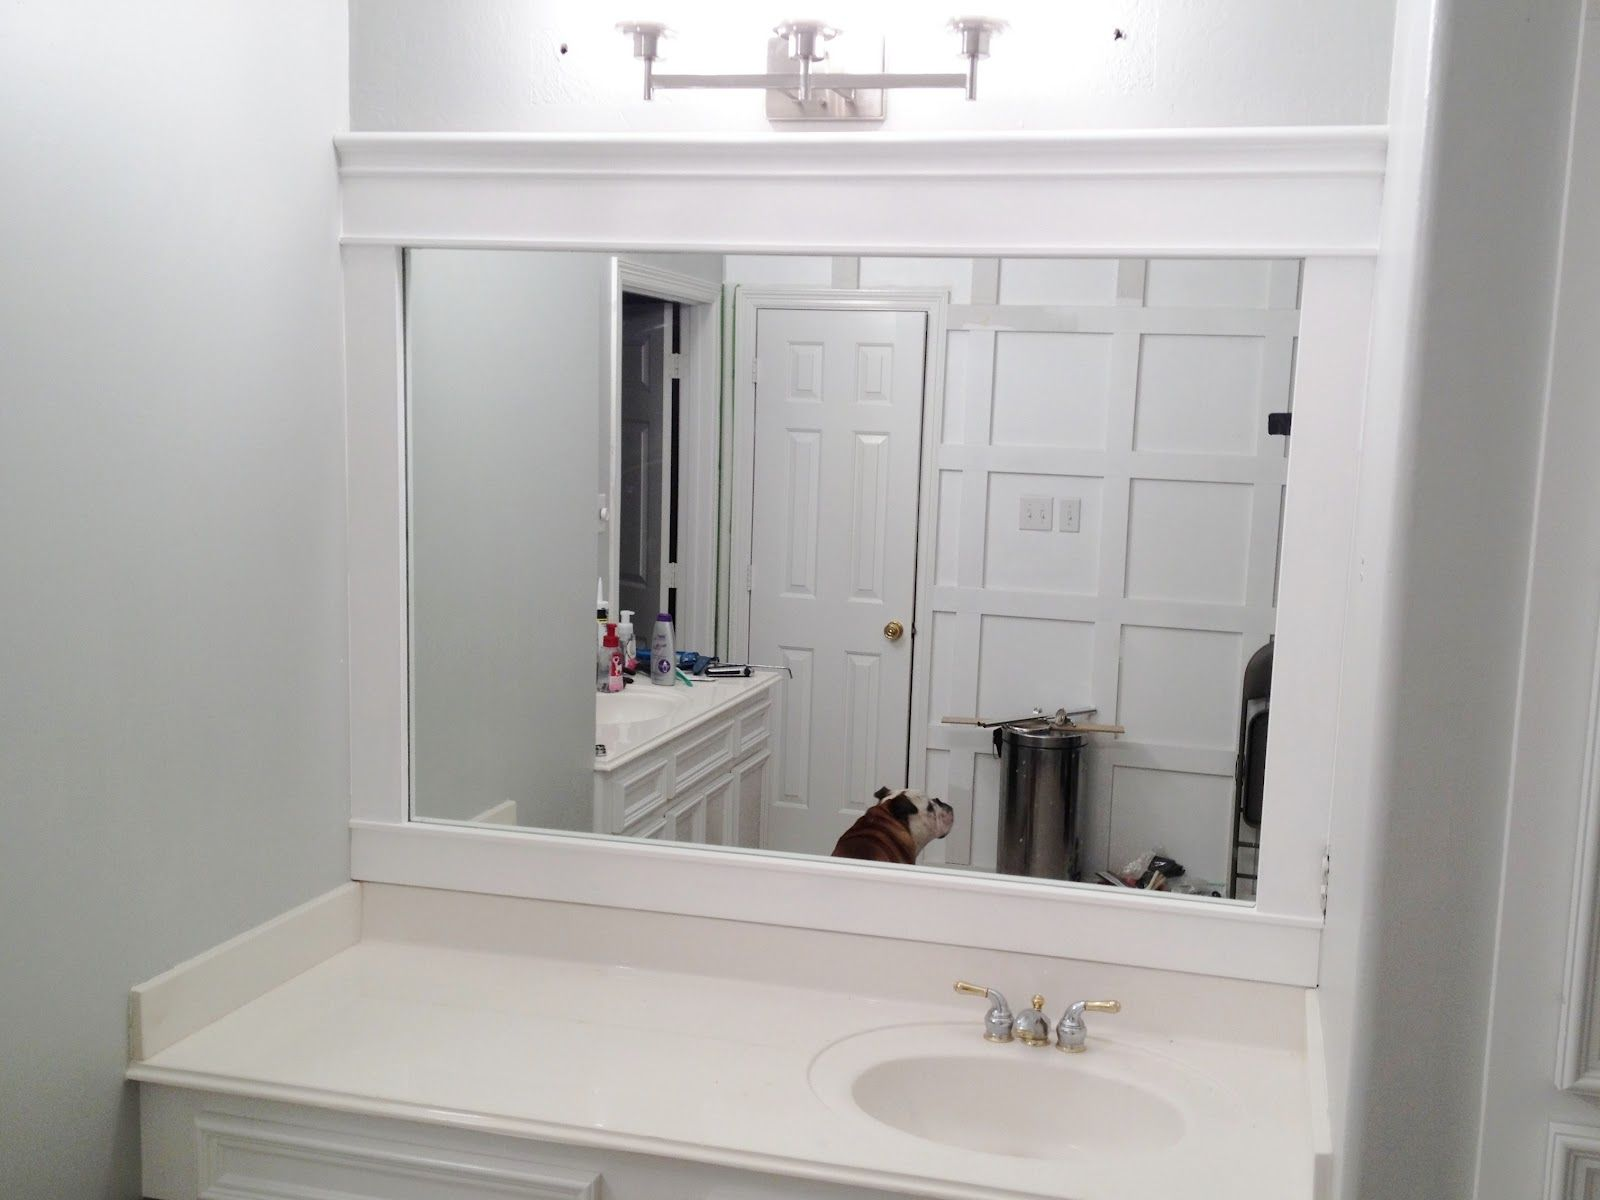 Bathroom Interior Elegant White Framed Wall Mirror Over Marble